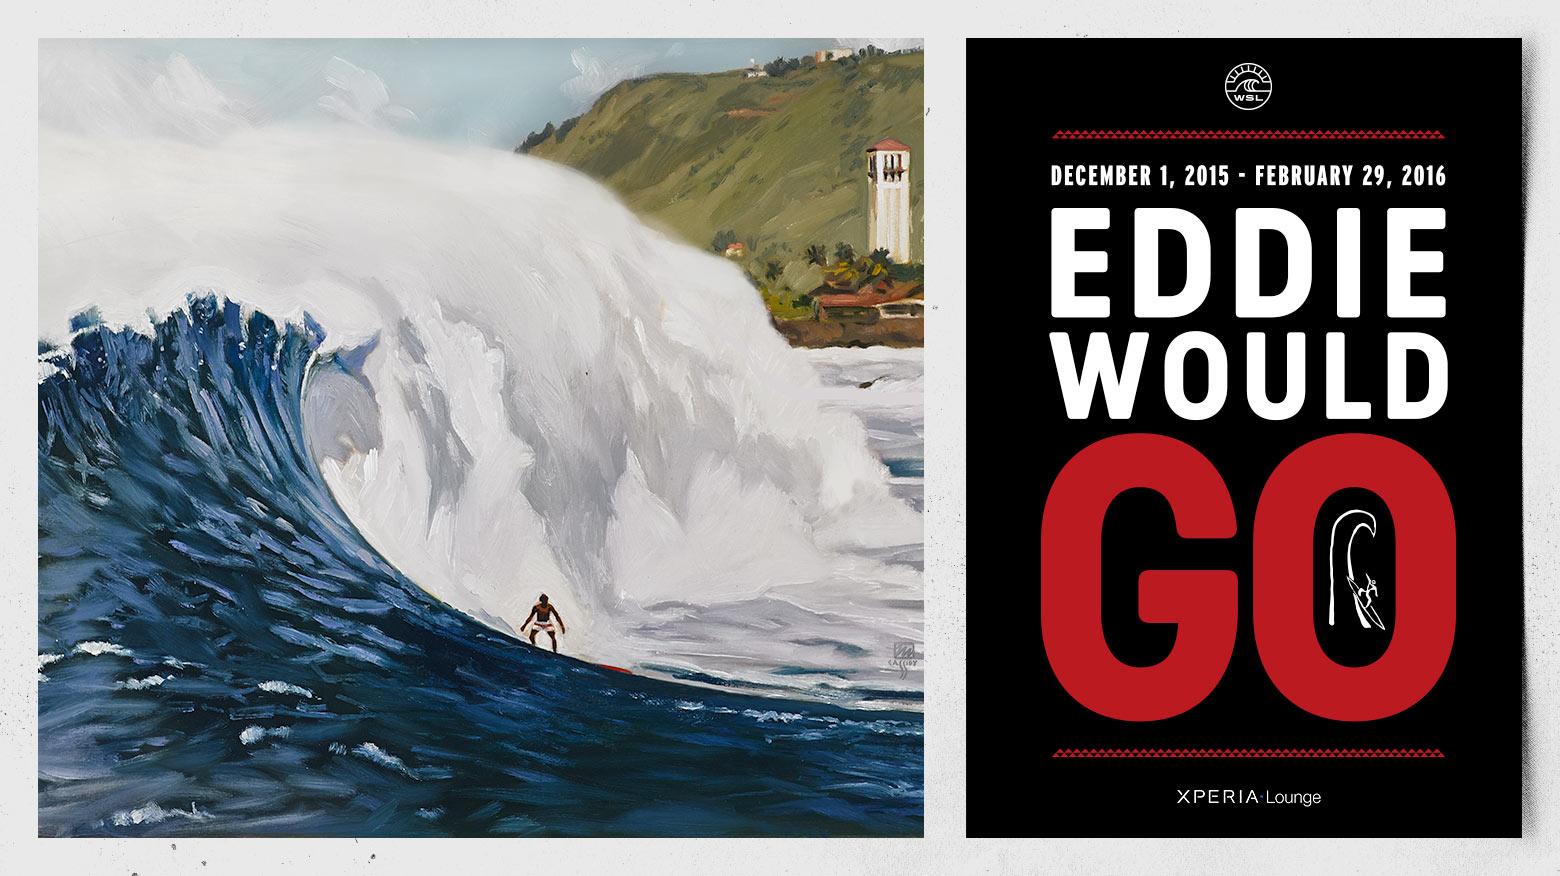 Video Highlights From Eddie Aikau Big Wave Surf Comp Yesterday